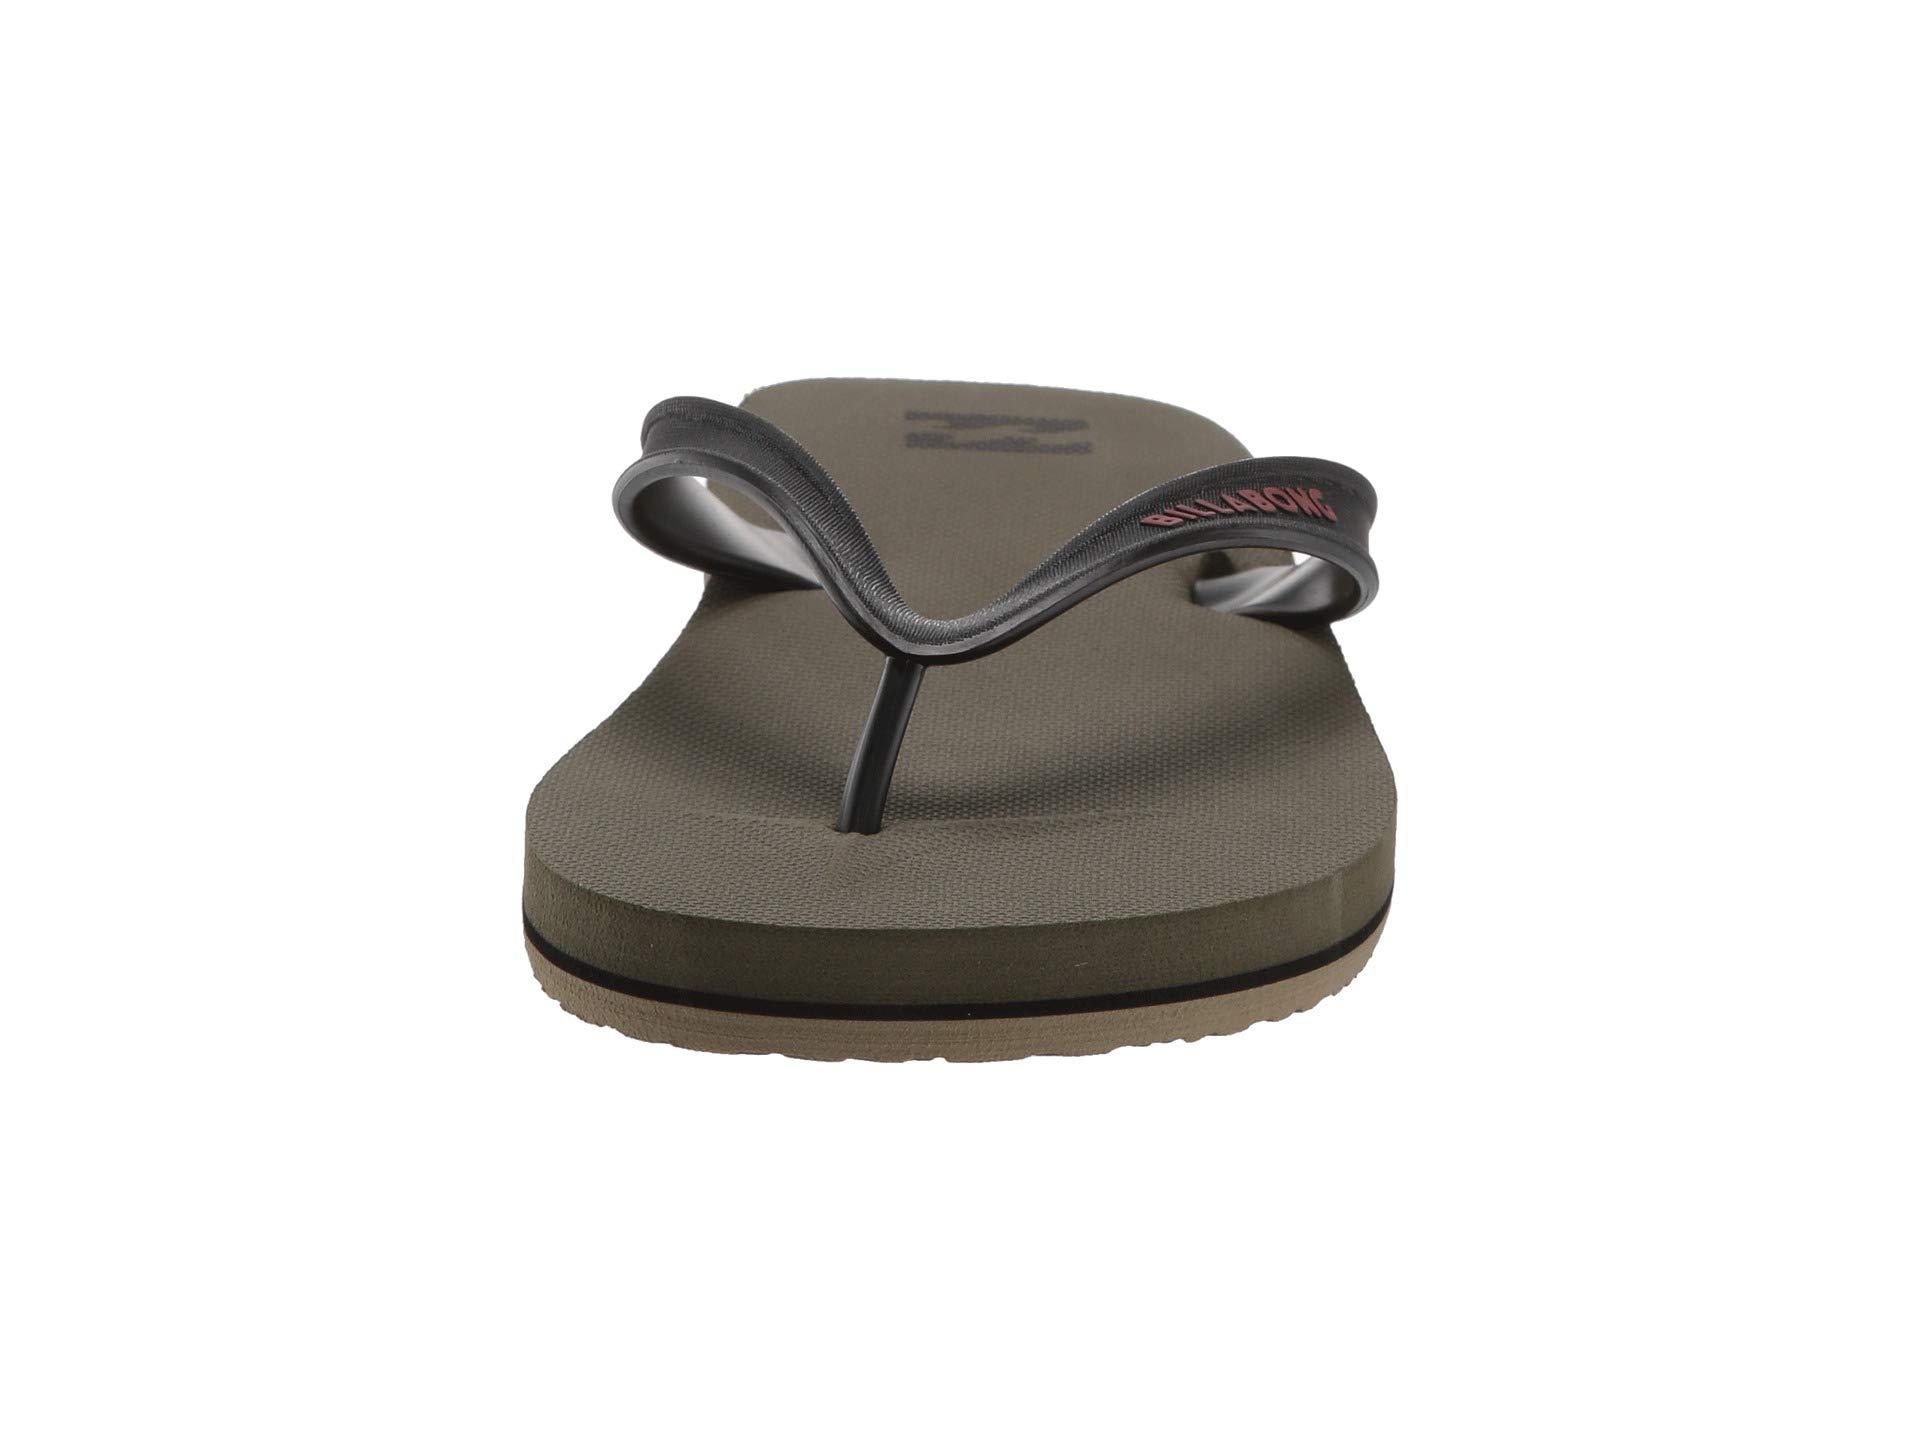 Day Solid Rrcqwtr Billabong Sandals Sandal Military All L35R4Aj